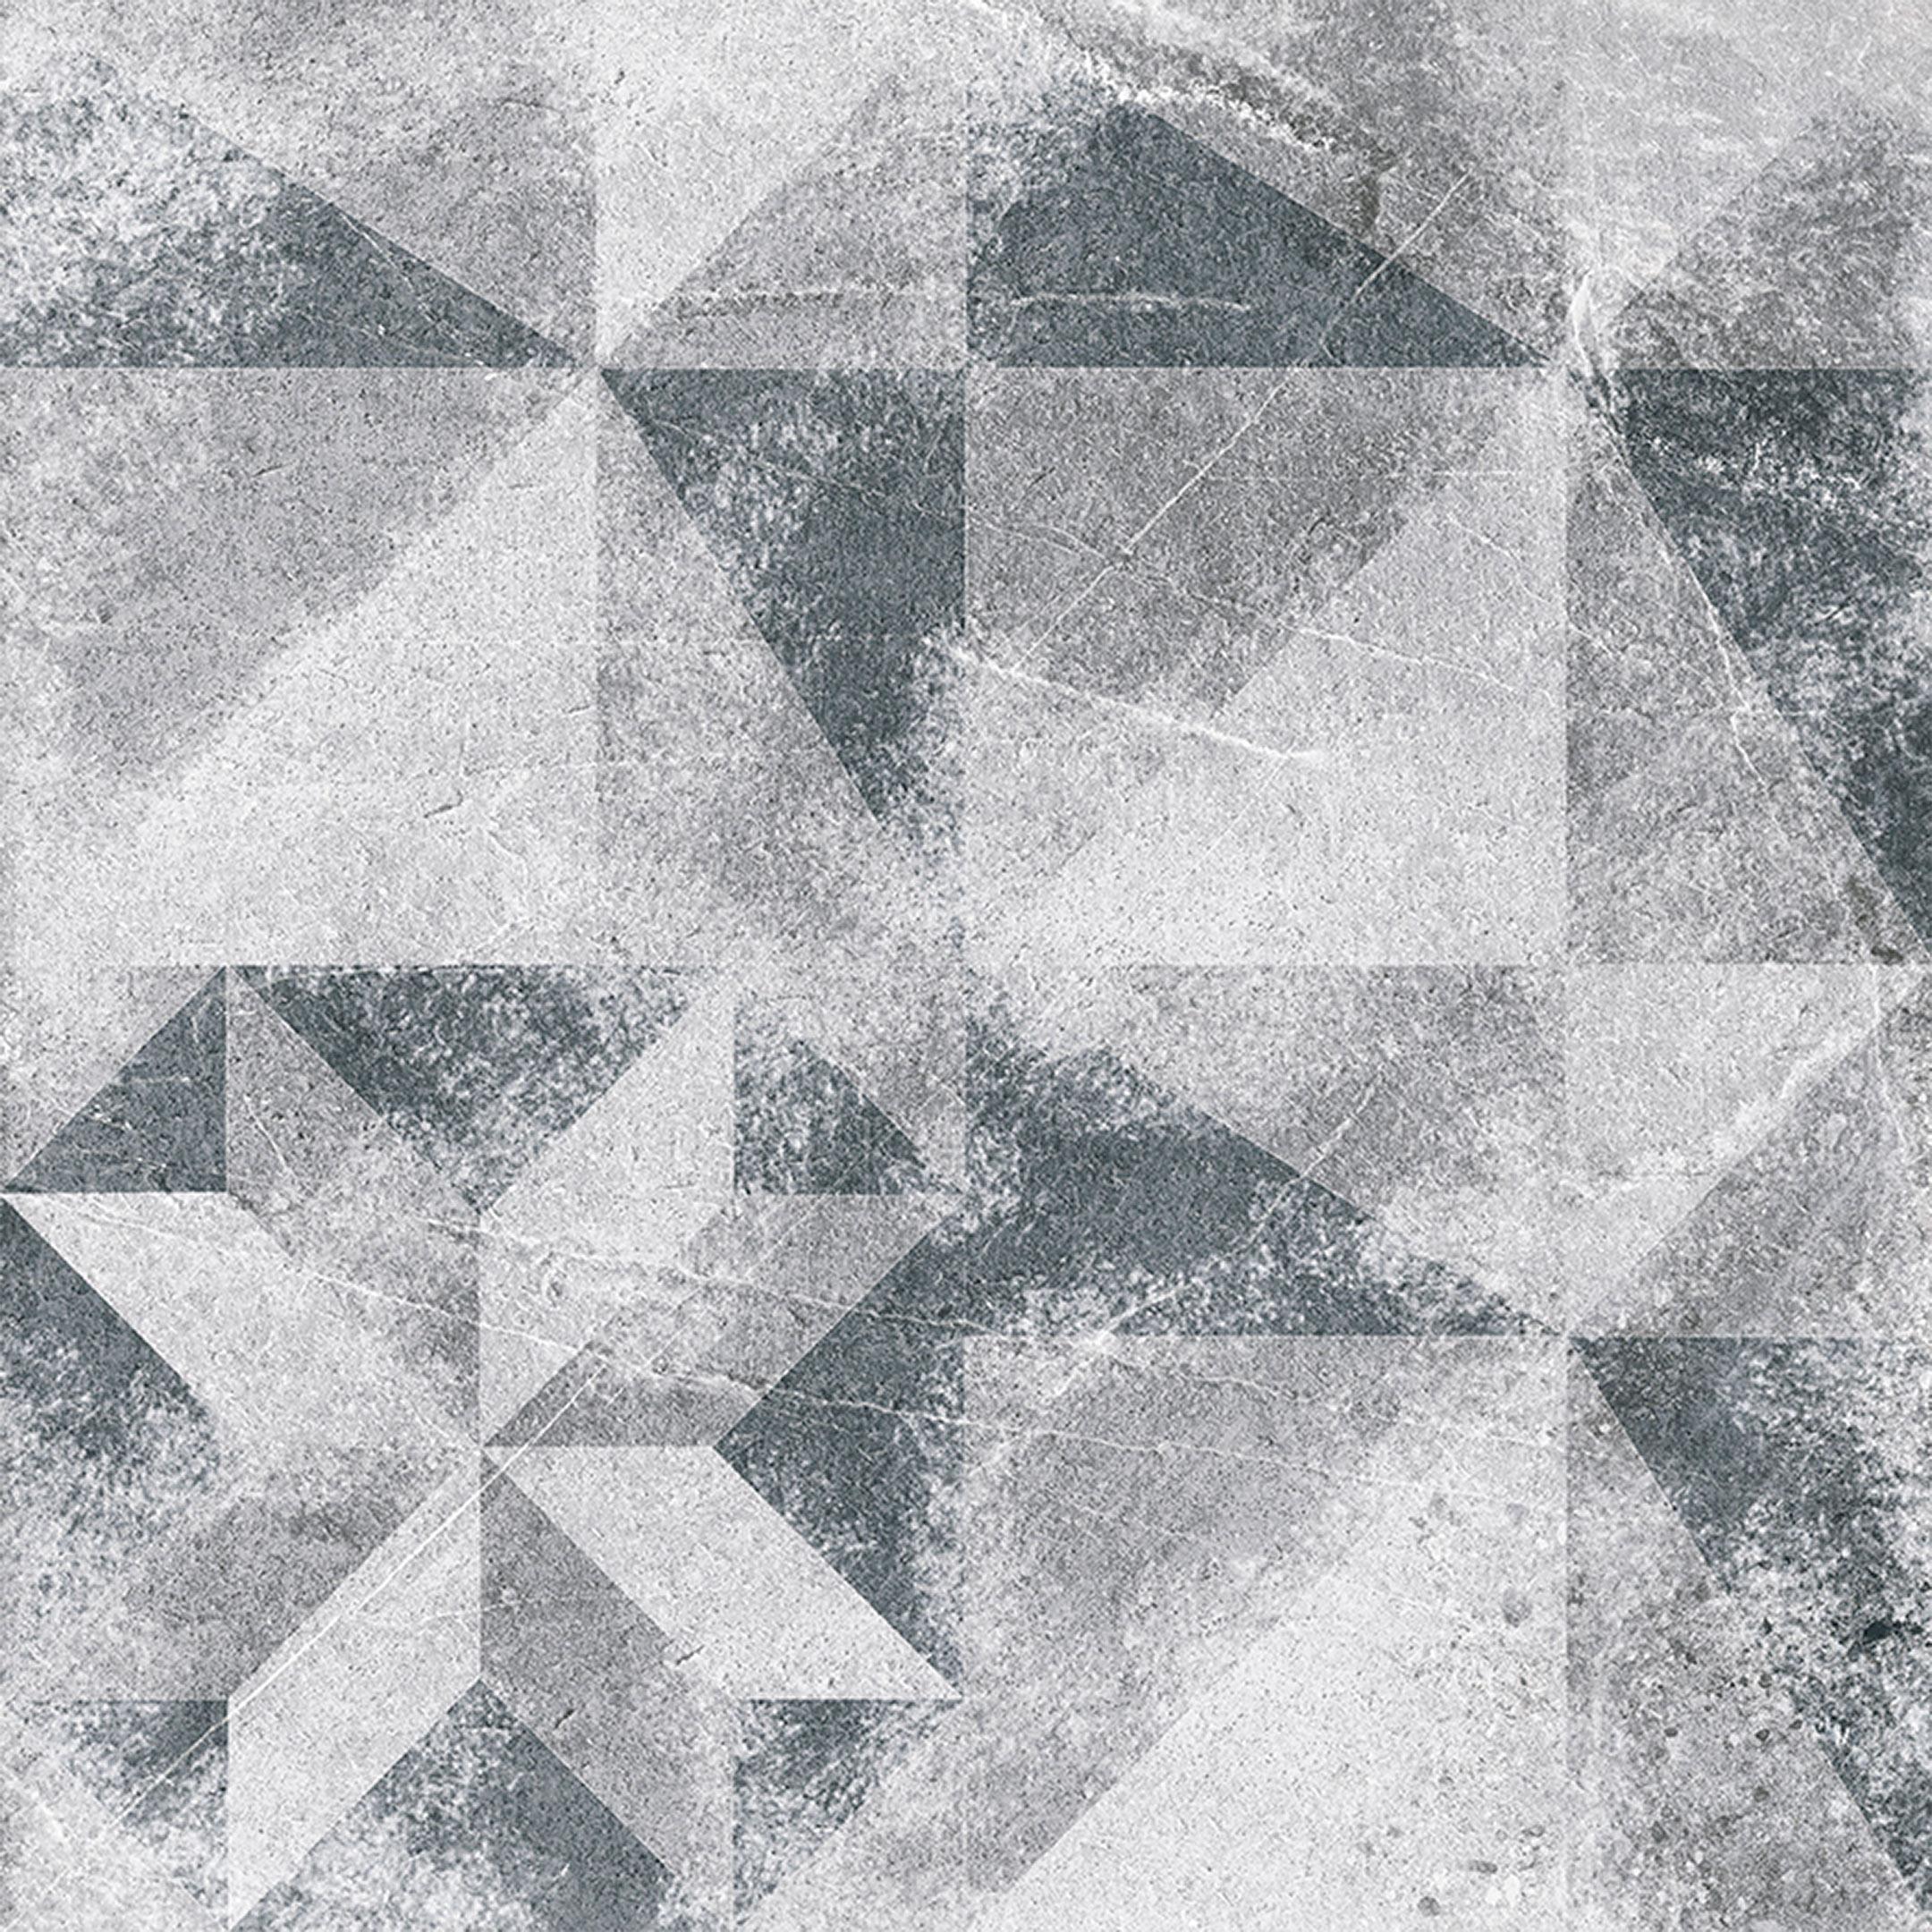 Керамогранит Grasaro Rift декор серый 400х400х8 мм керамогранит grasaro atrium серый 400х400х8 мм 10 шт 1 6 кв м